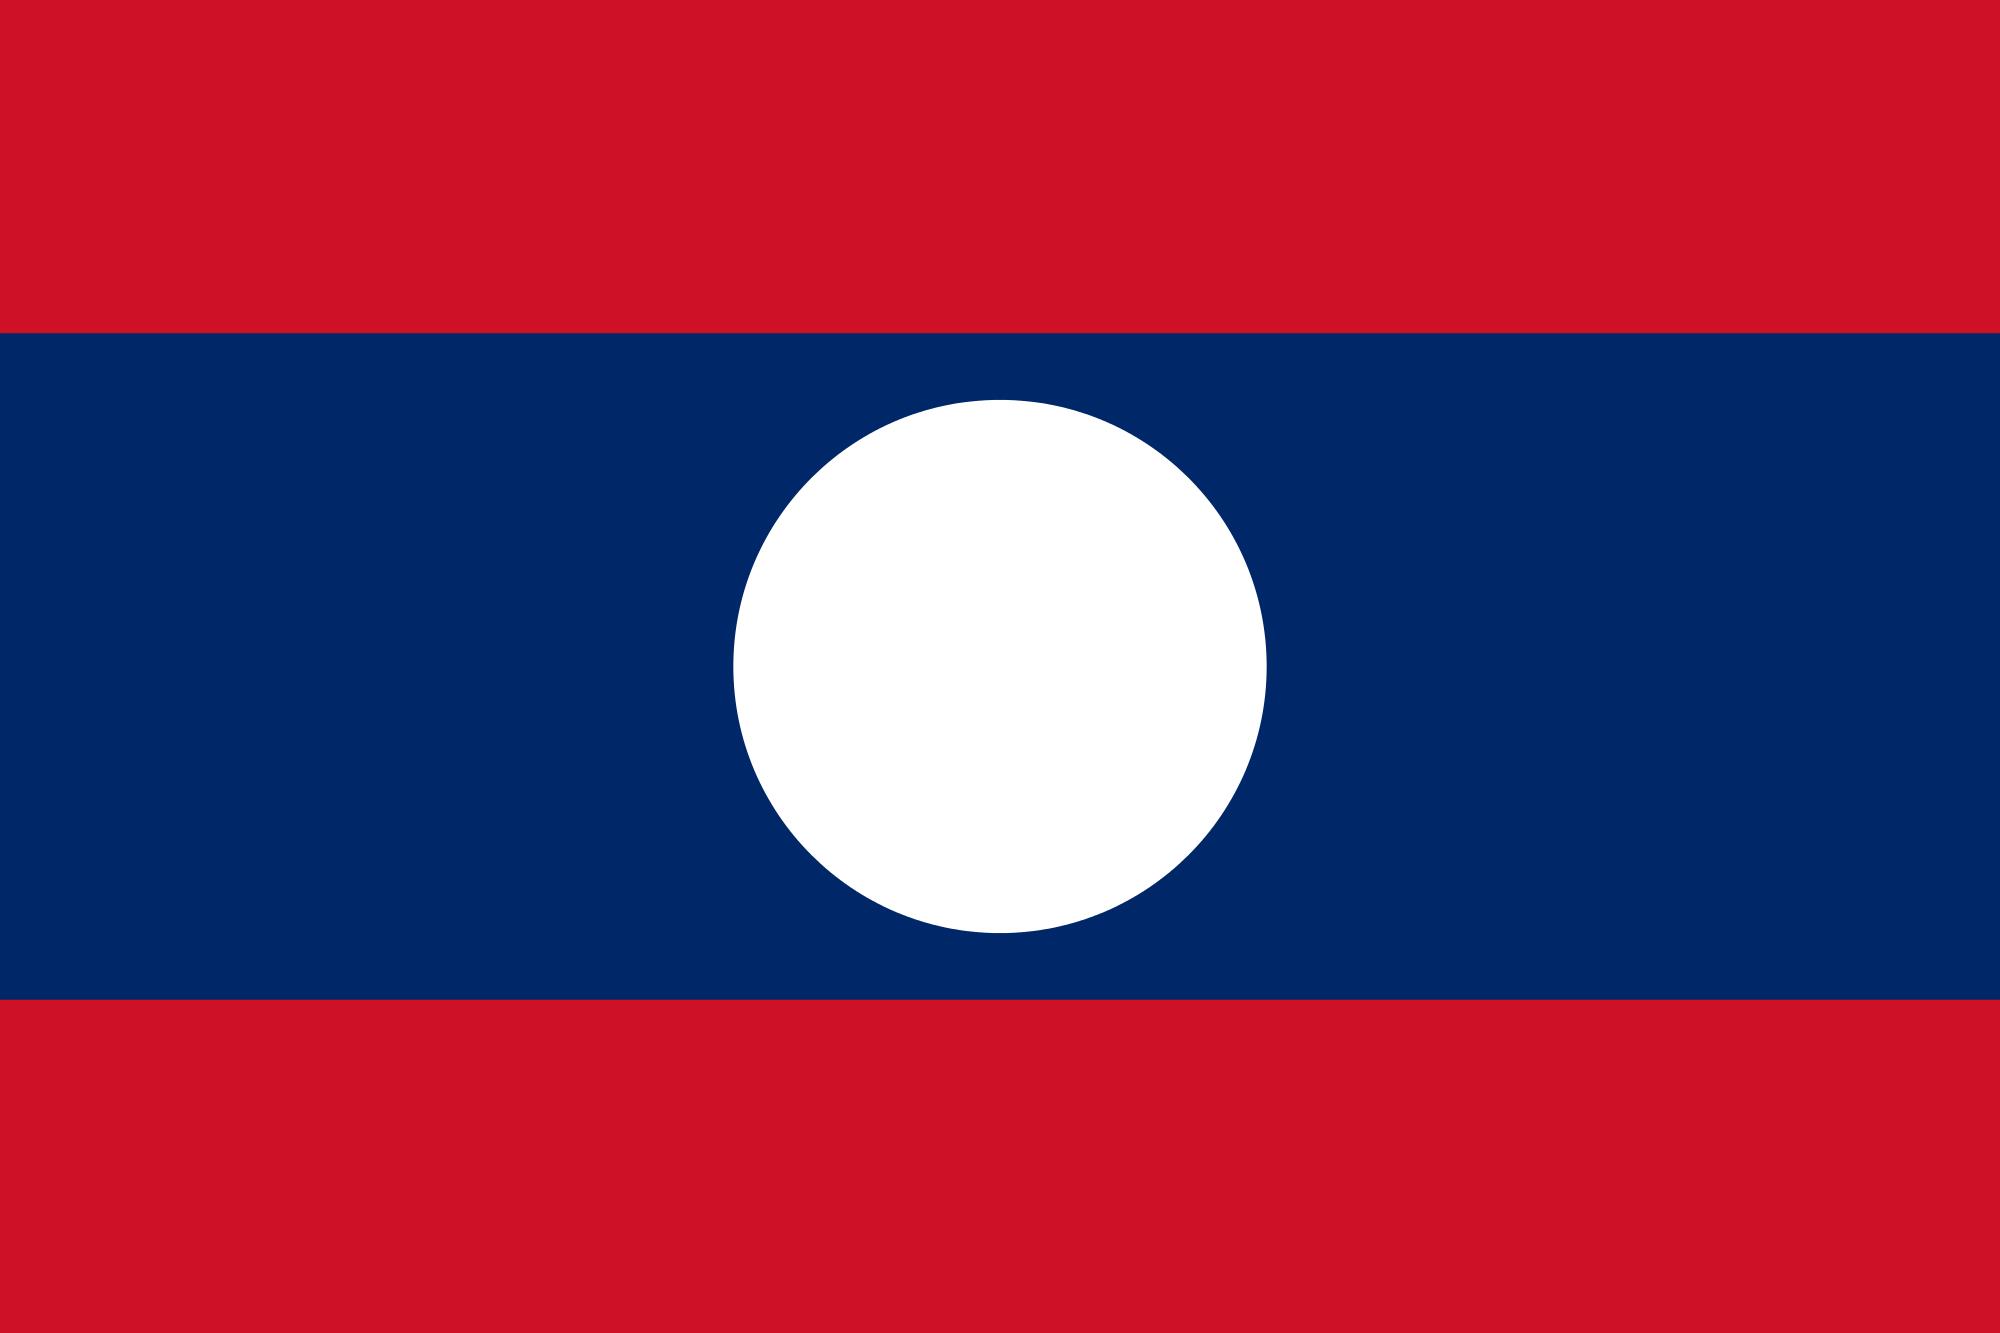 National Flag of Laos